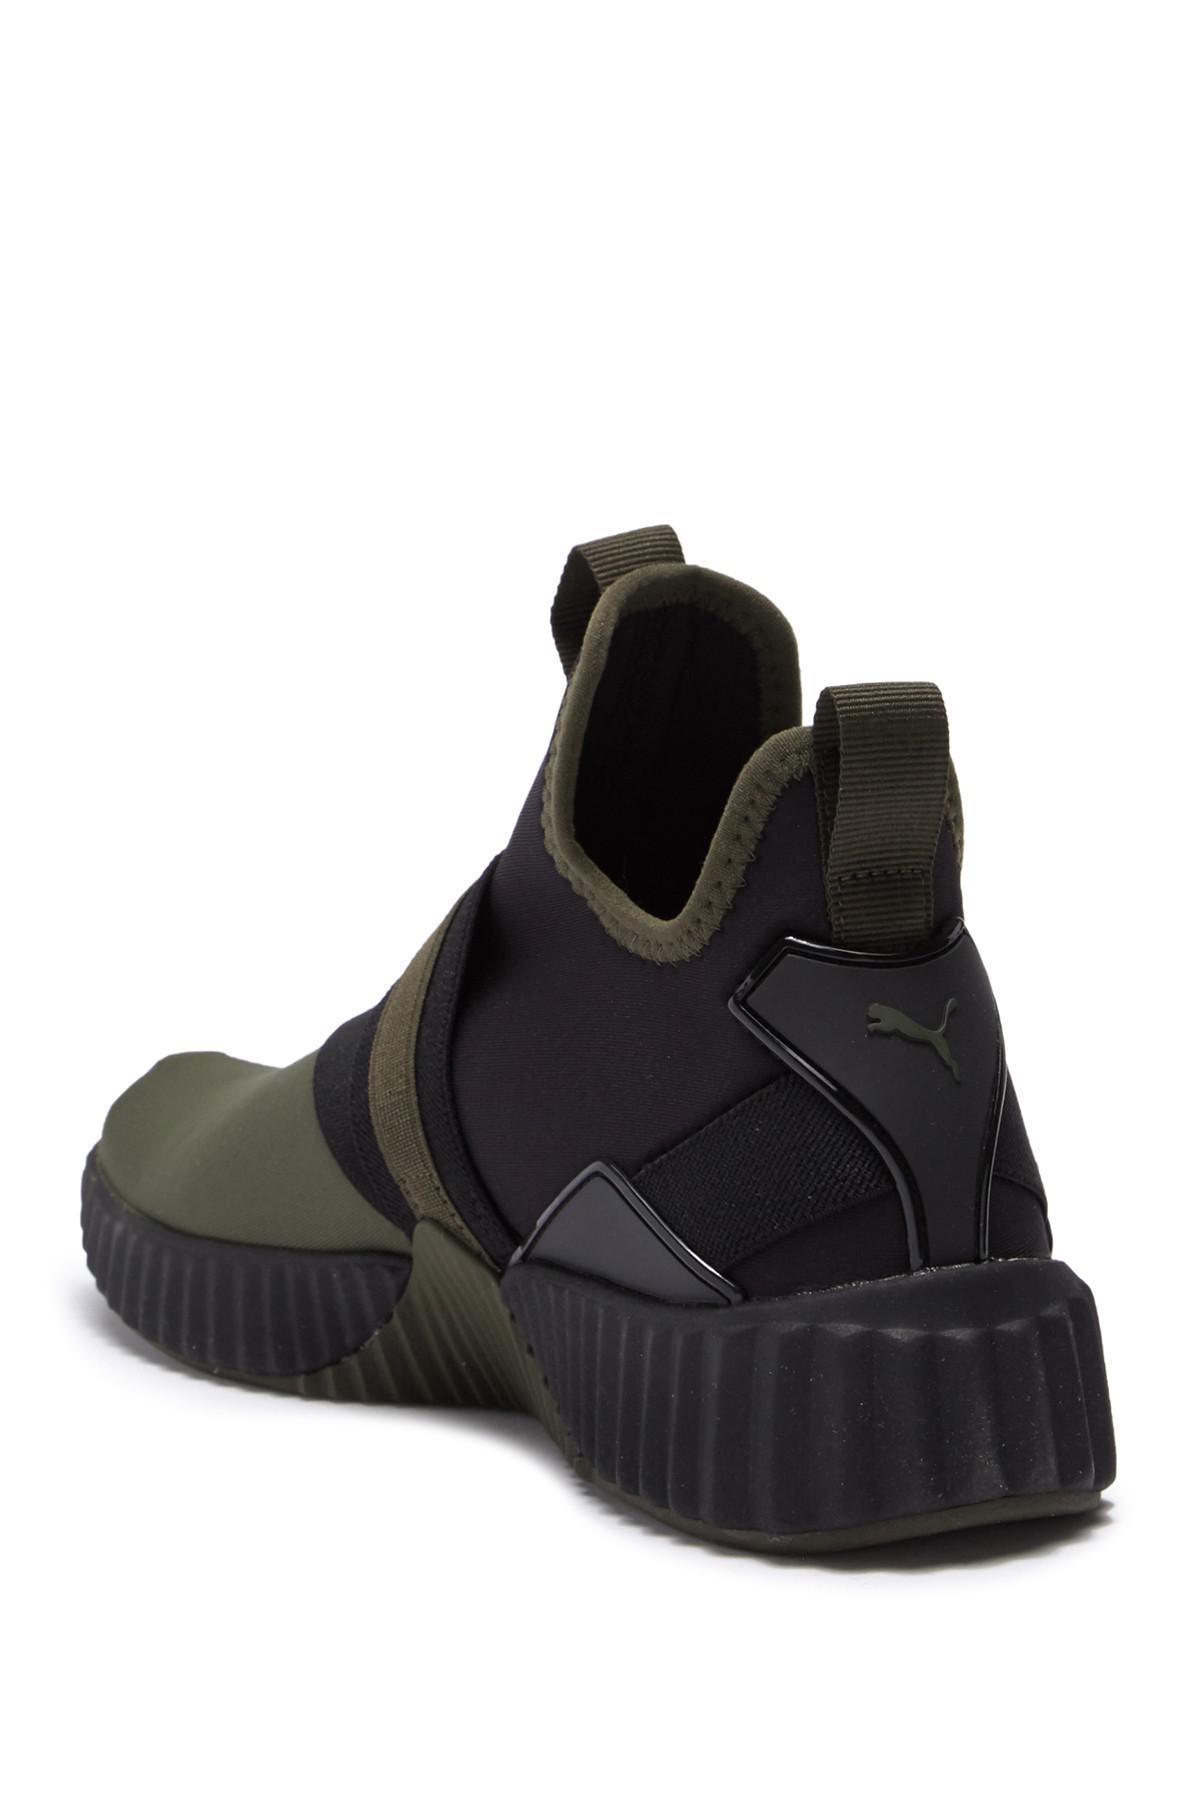 PUMA Defy Mid Street Wns Sneaker in